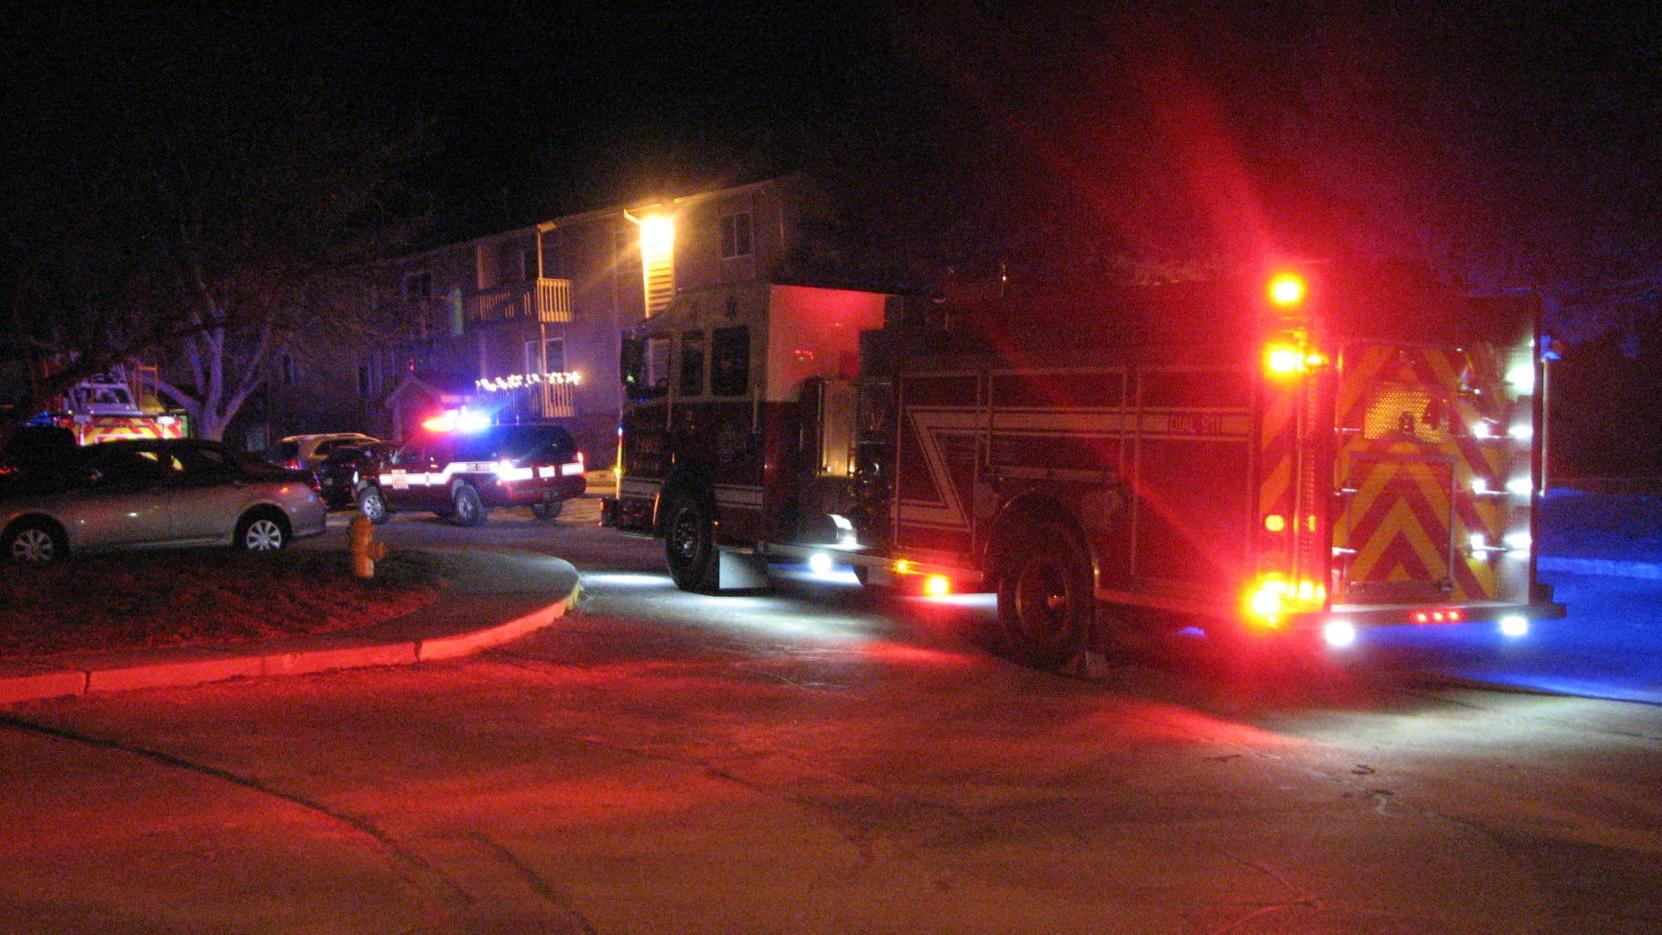 Fire department responds to Saturday evening deck fire